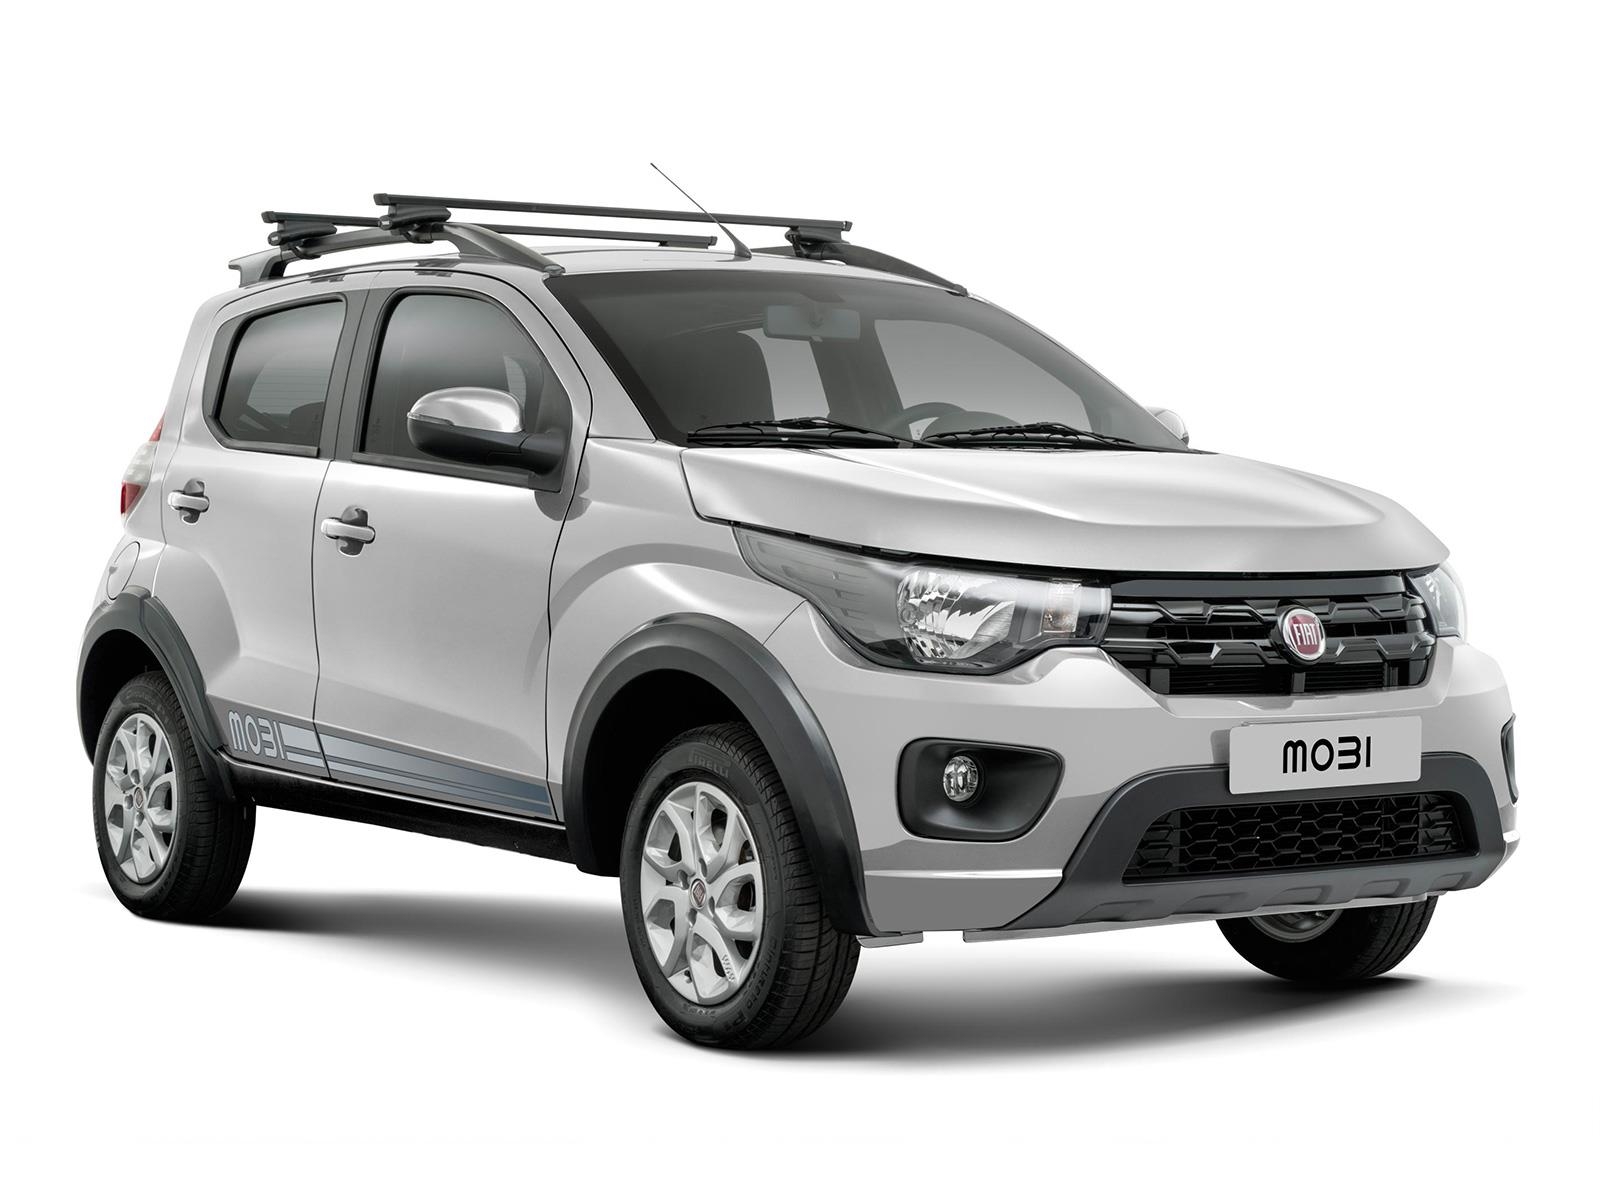 FIAT Mobi espiado en México - Autocosmos.com